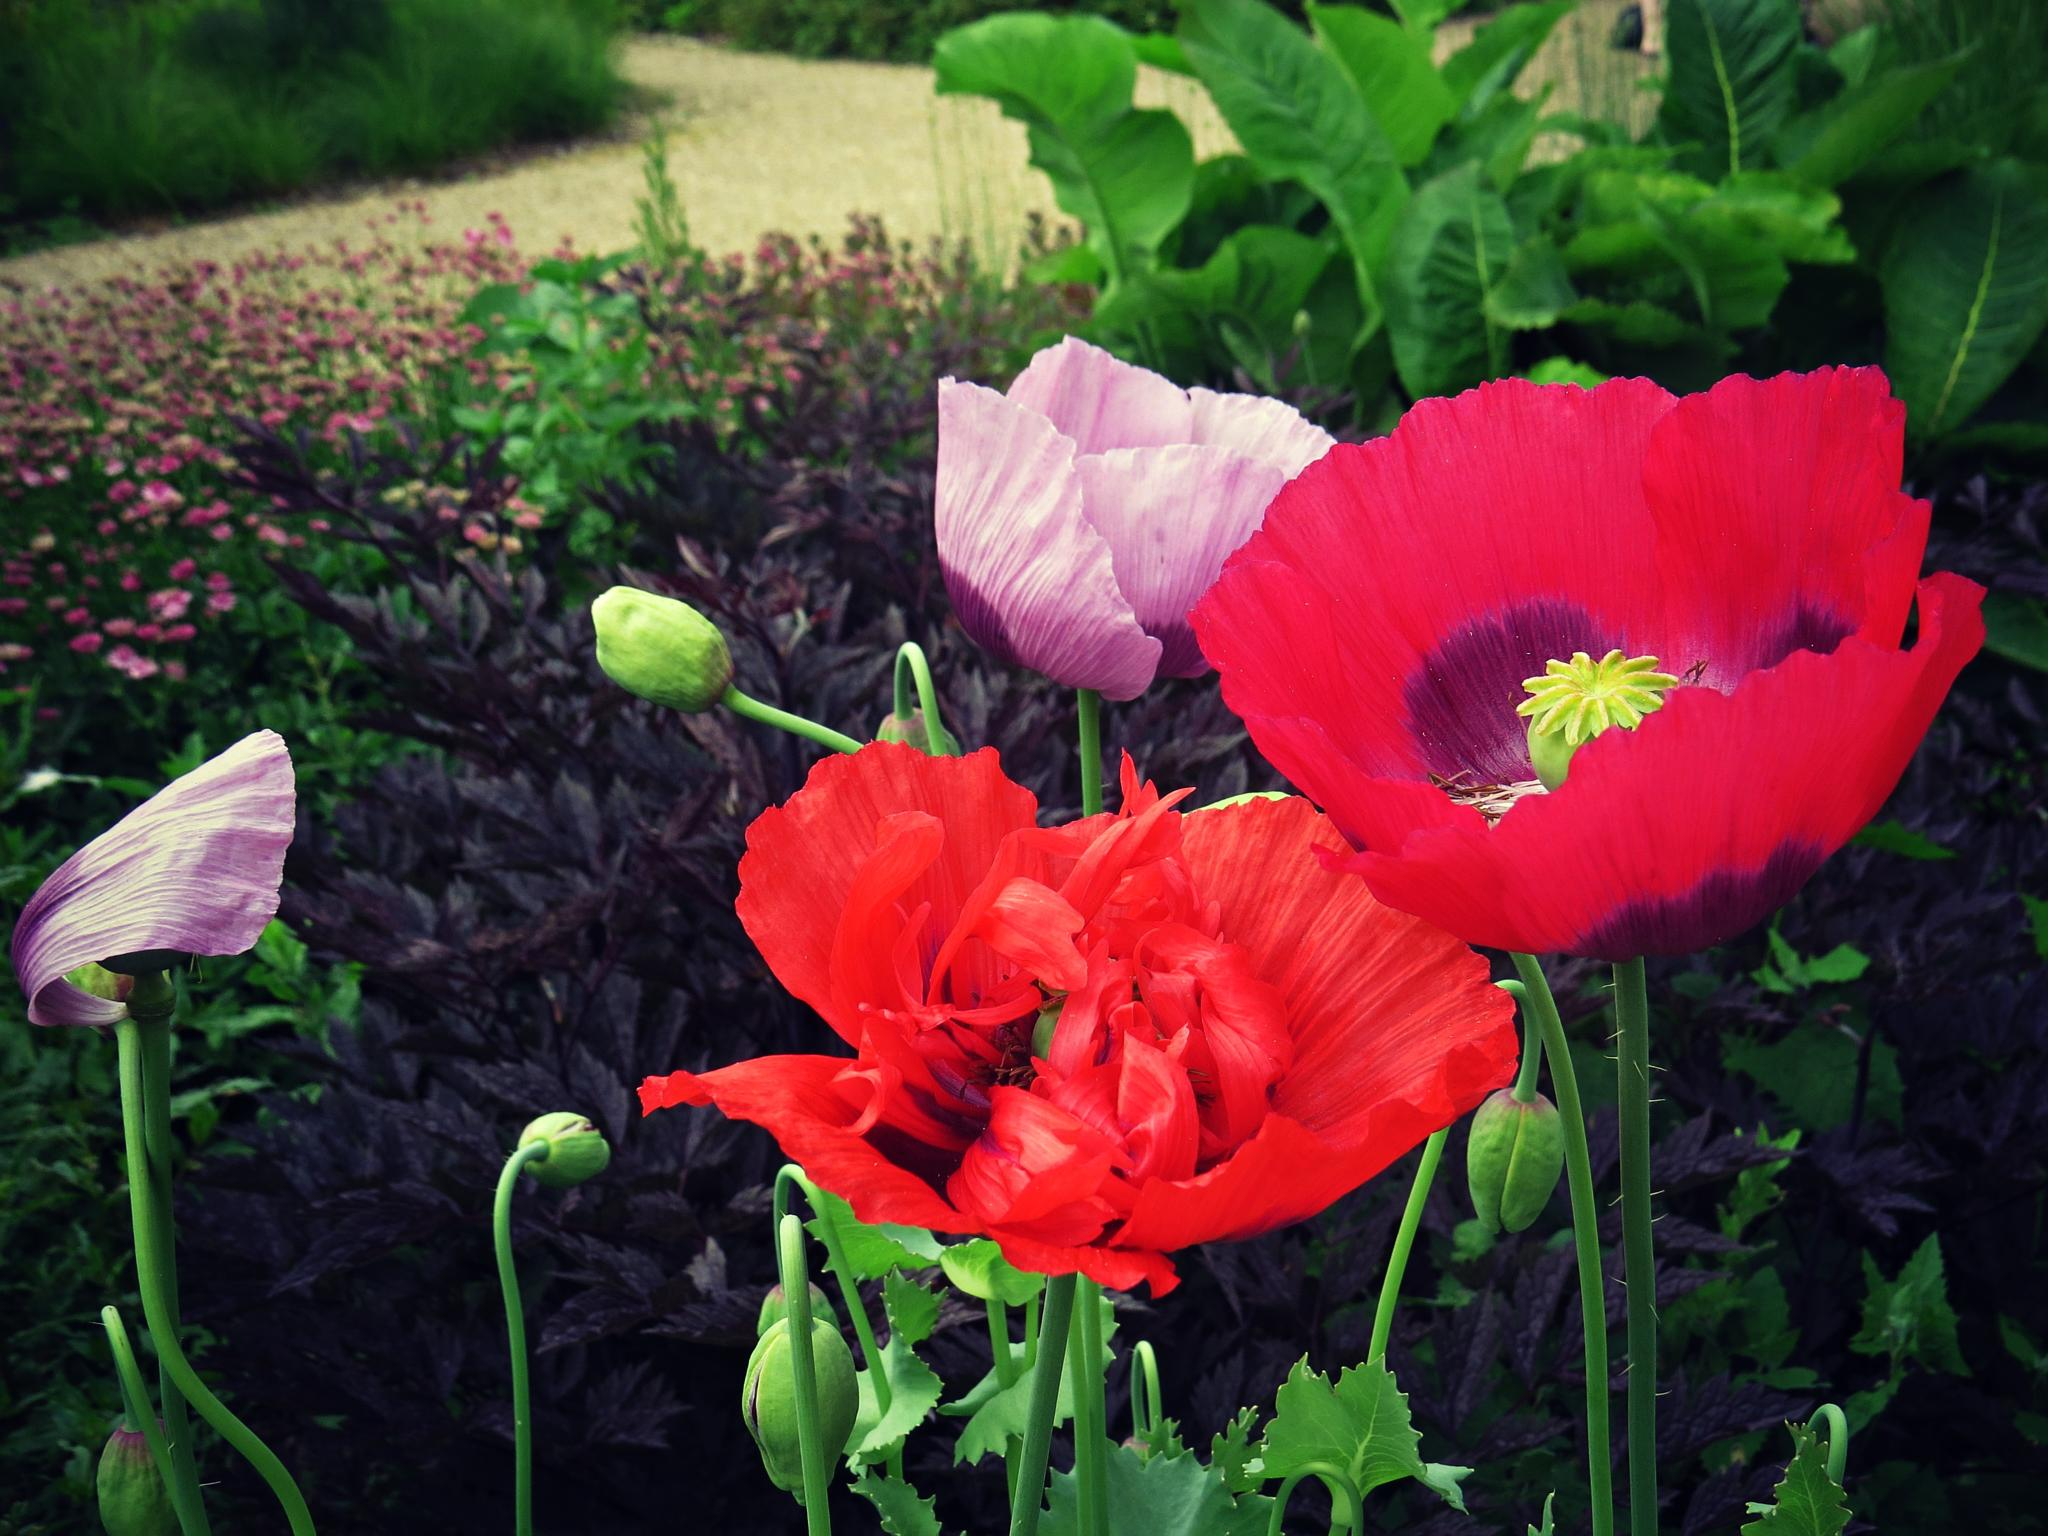 Flowers by Dacki76